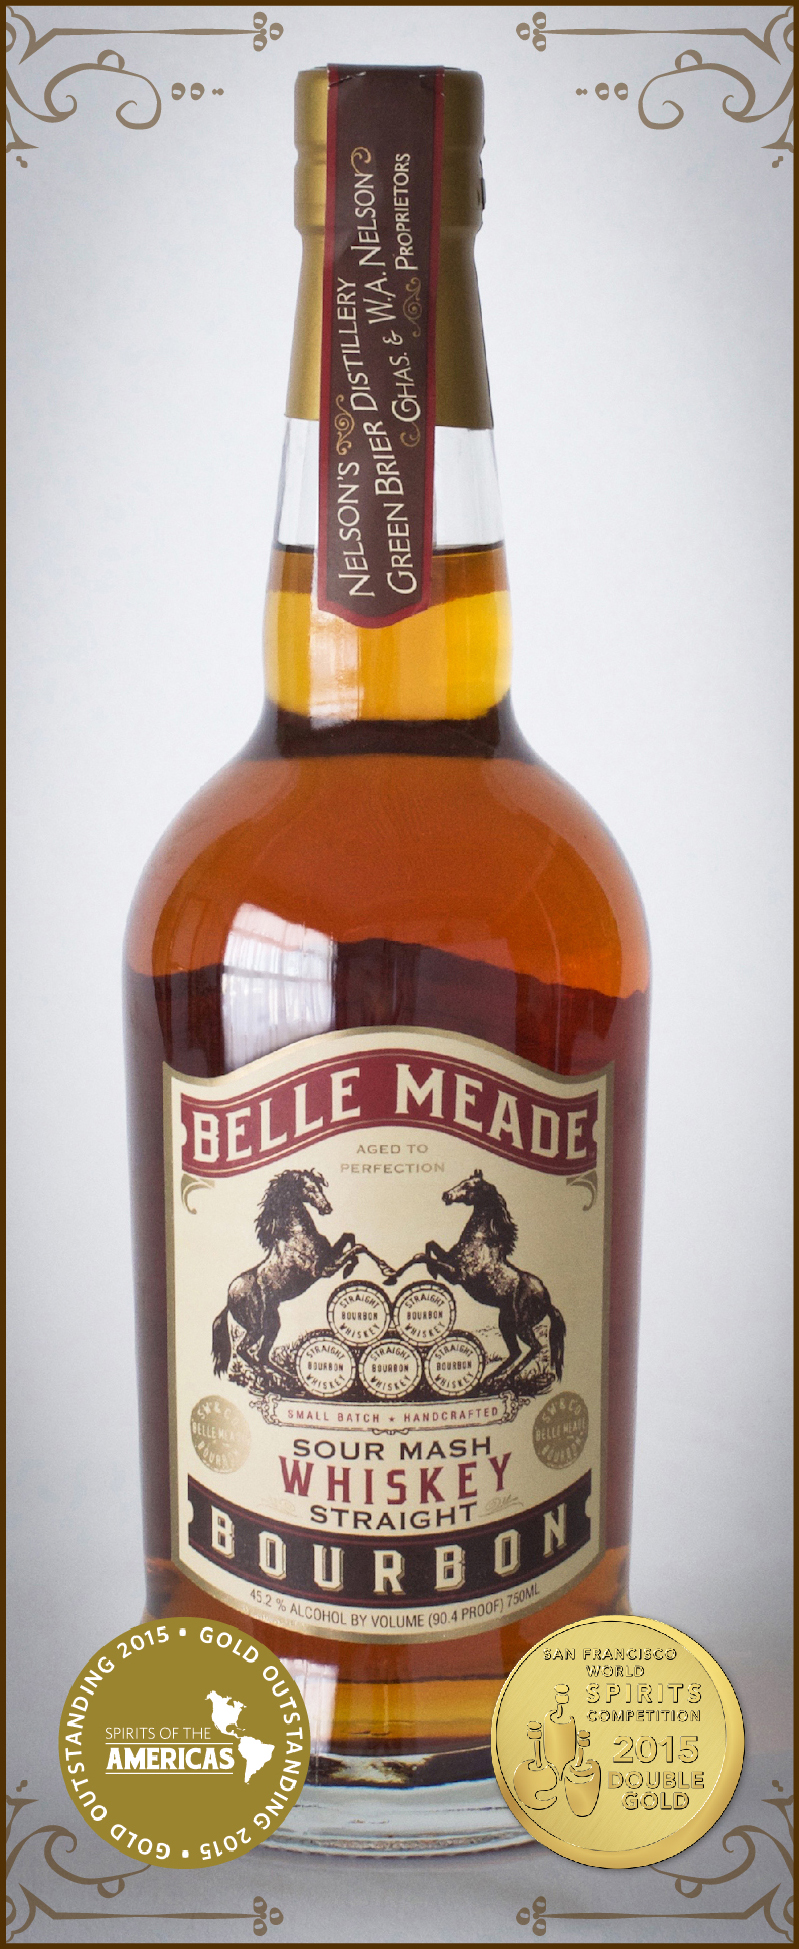 Belle Meade Bourbon from Nelson's Green Brier Distillery